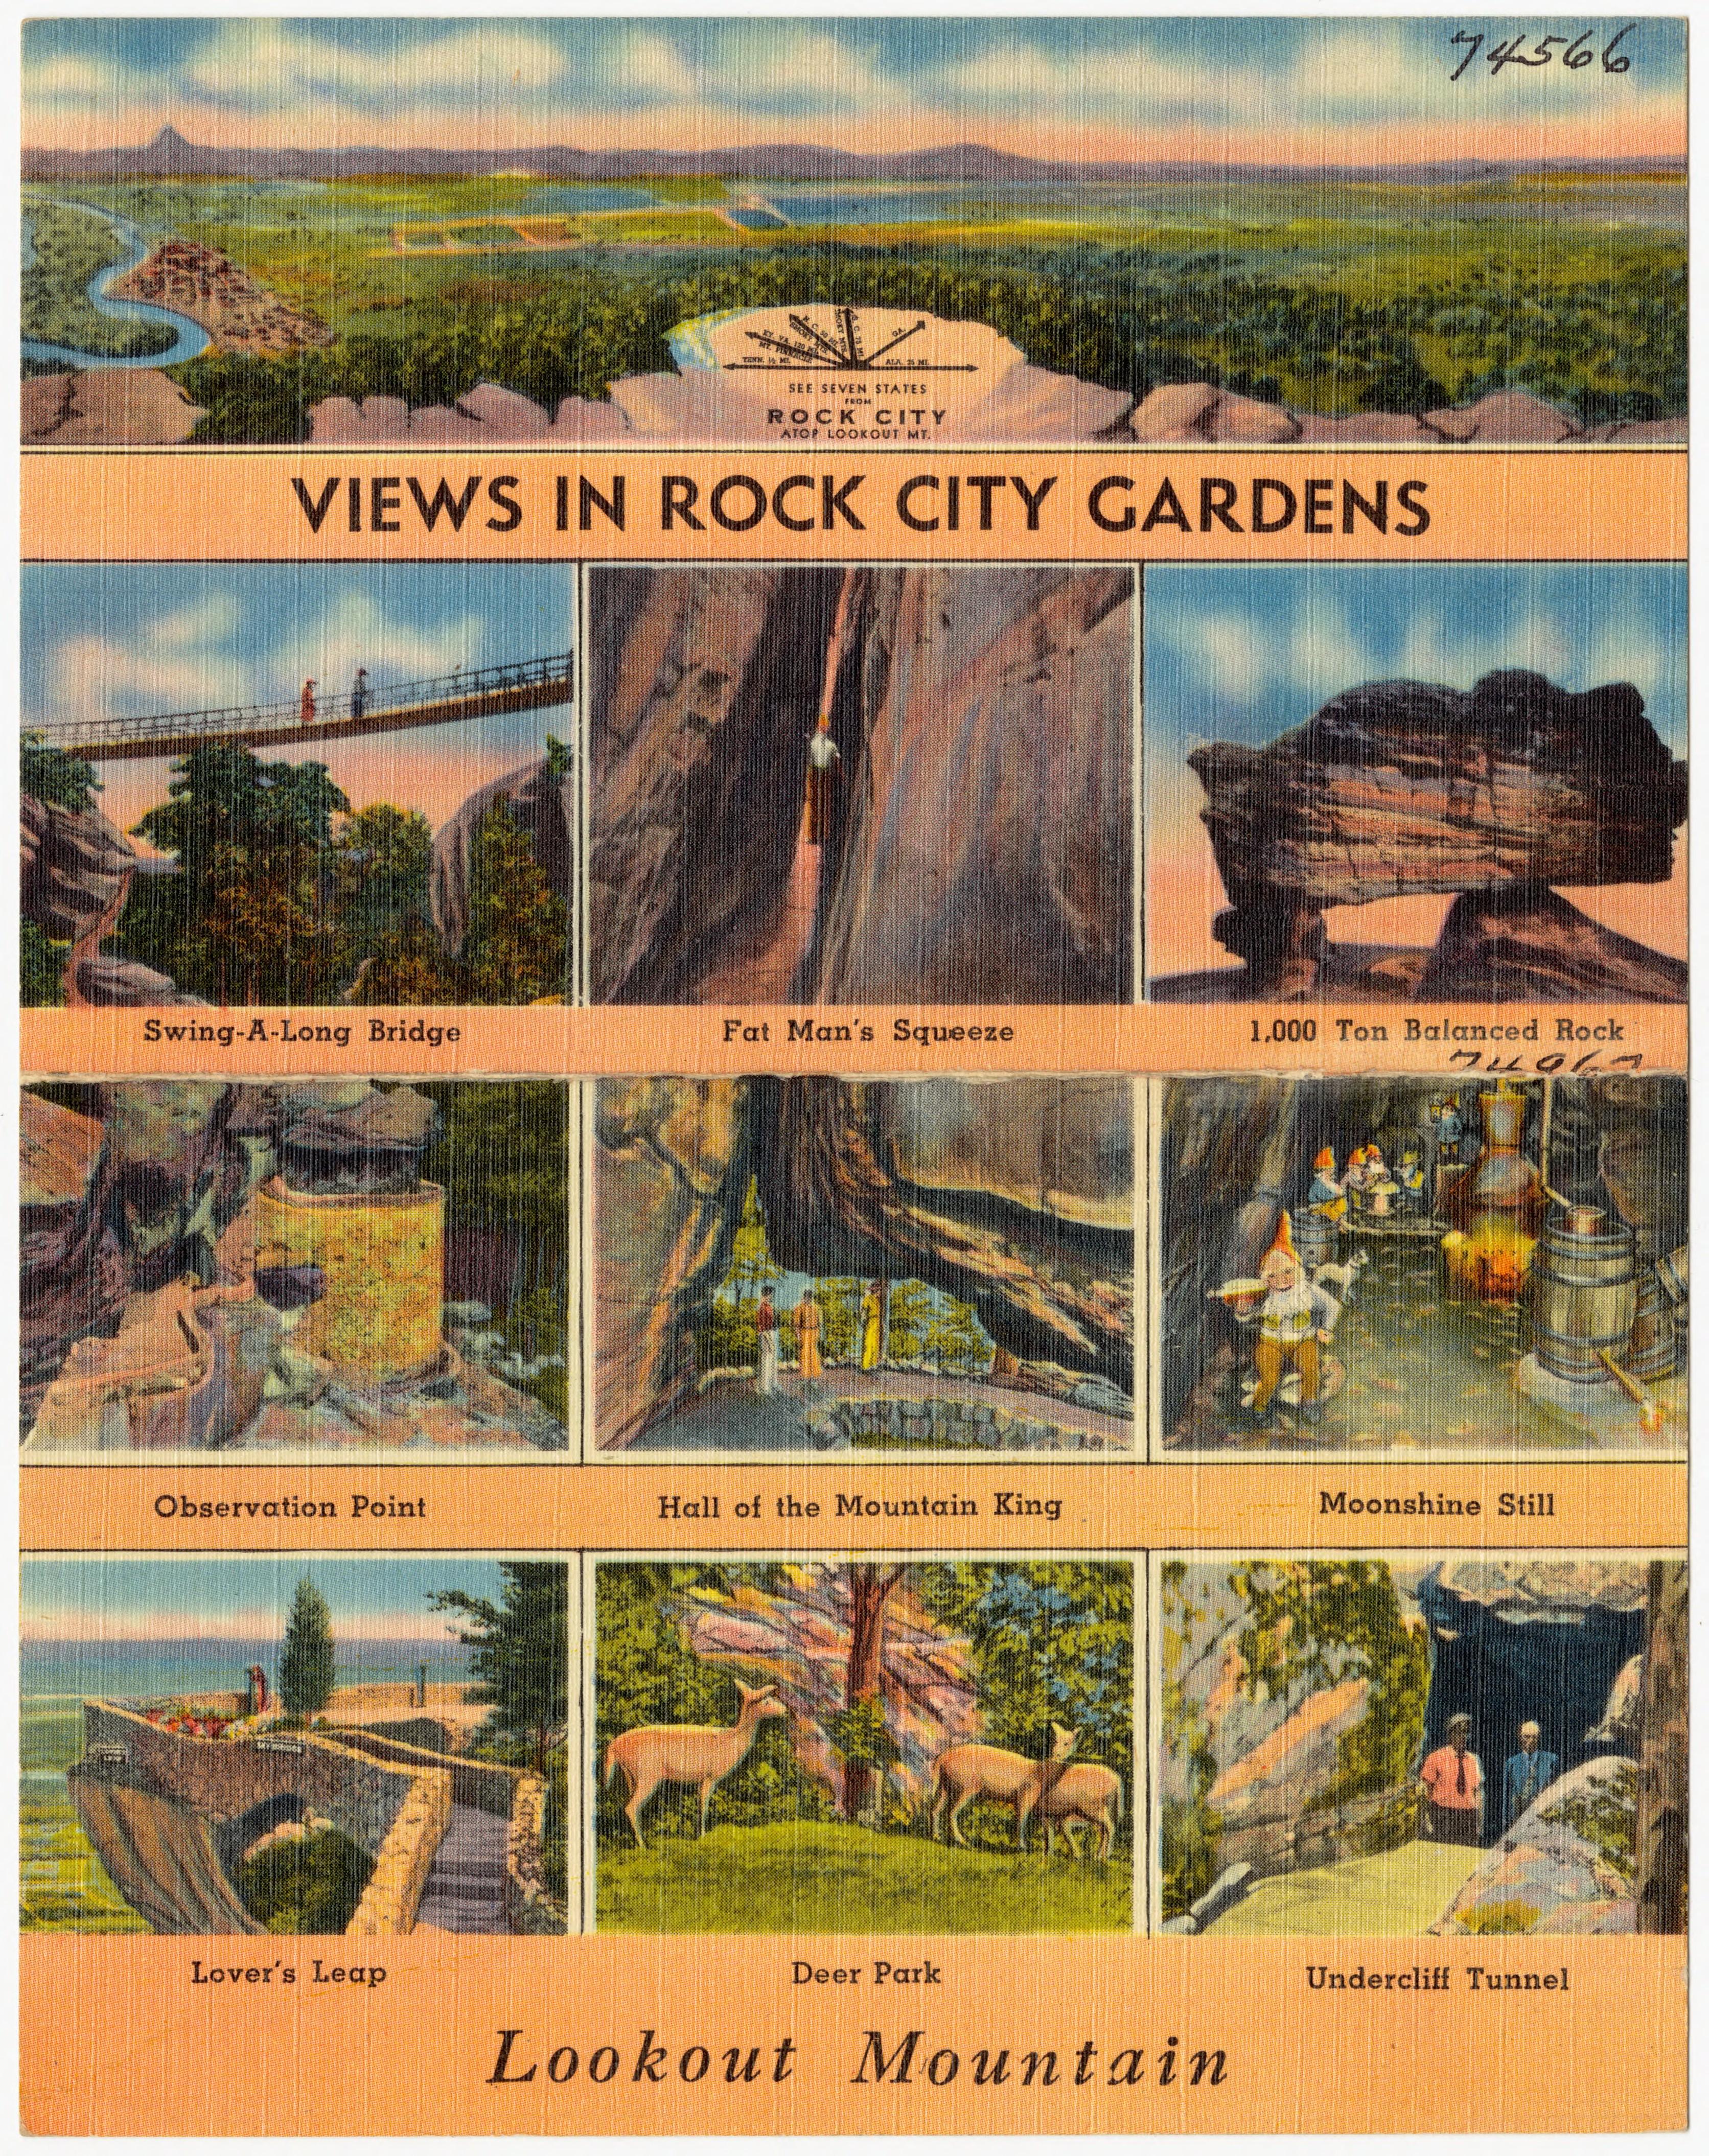 File:Views in Rock City Gardens, Lookout Mountain (74566).jpg ...